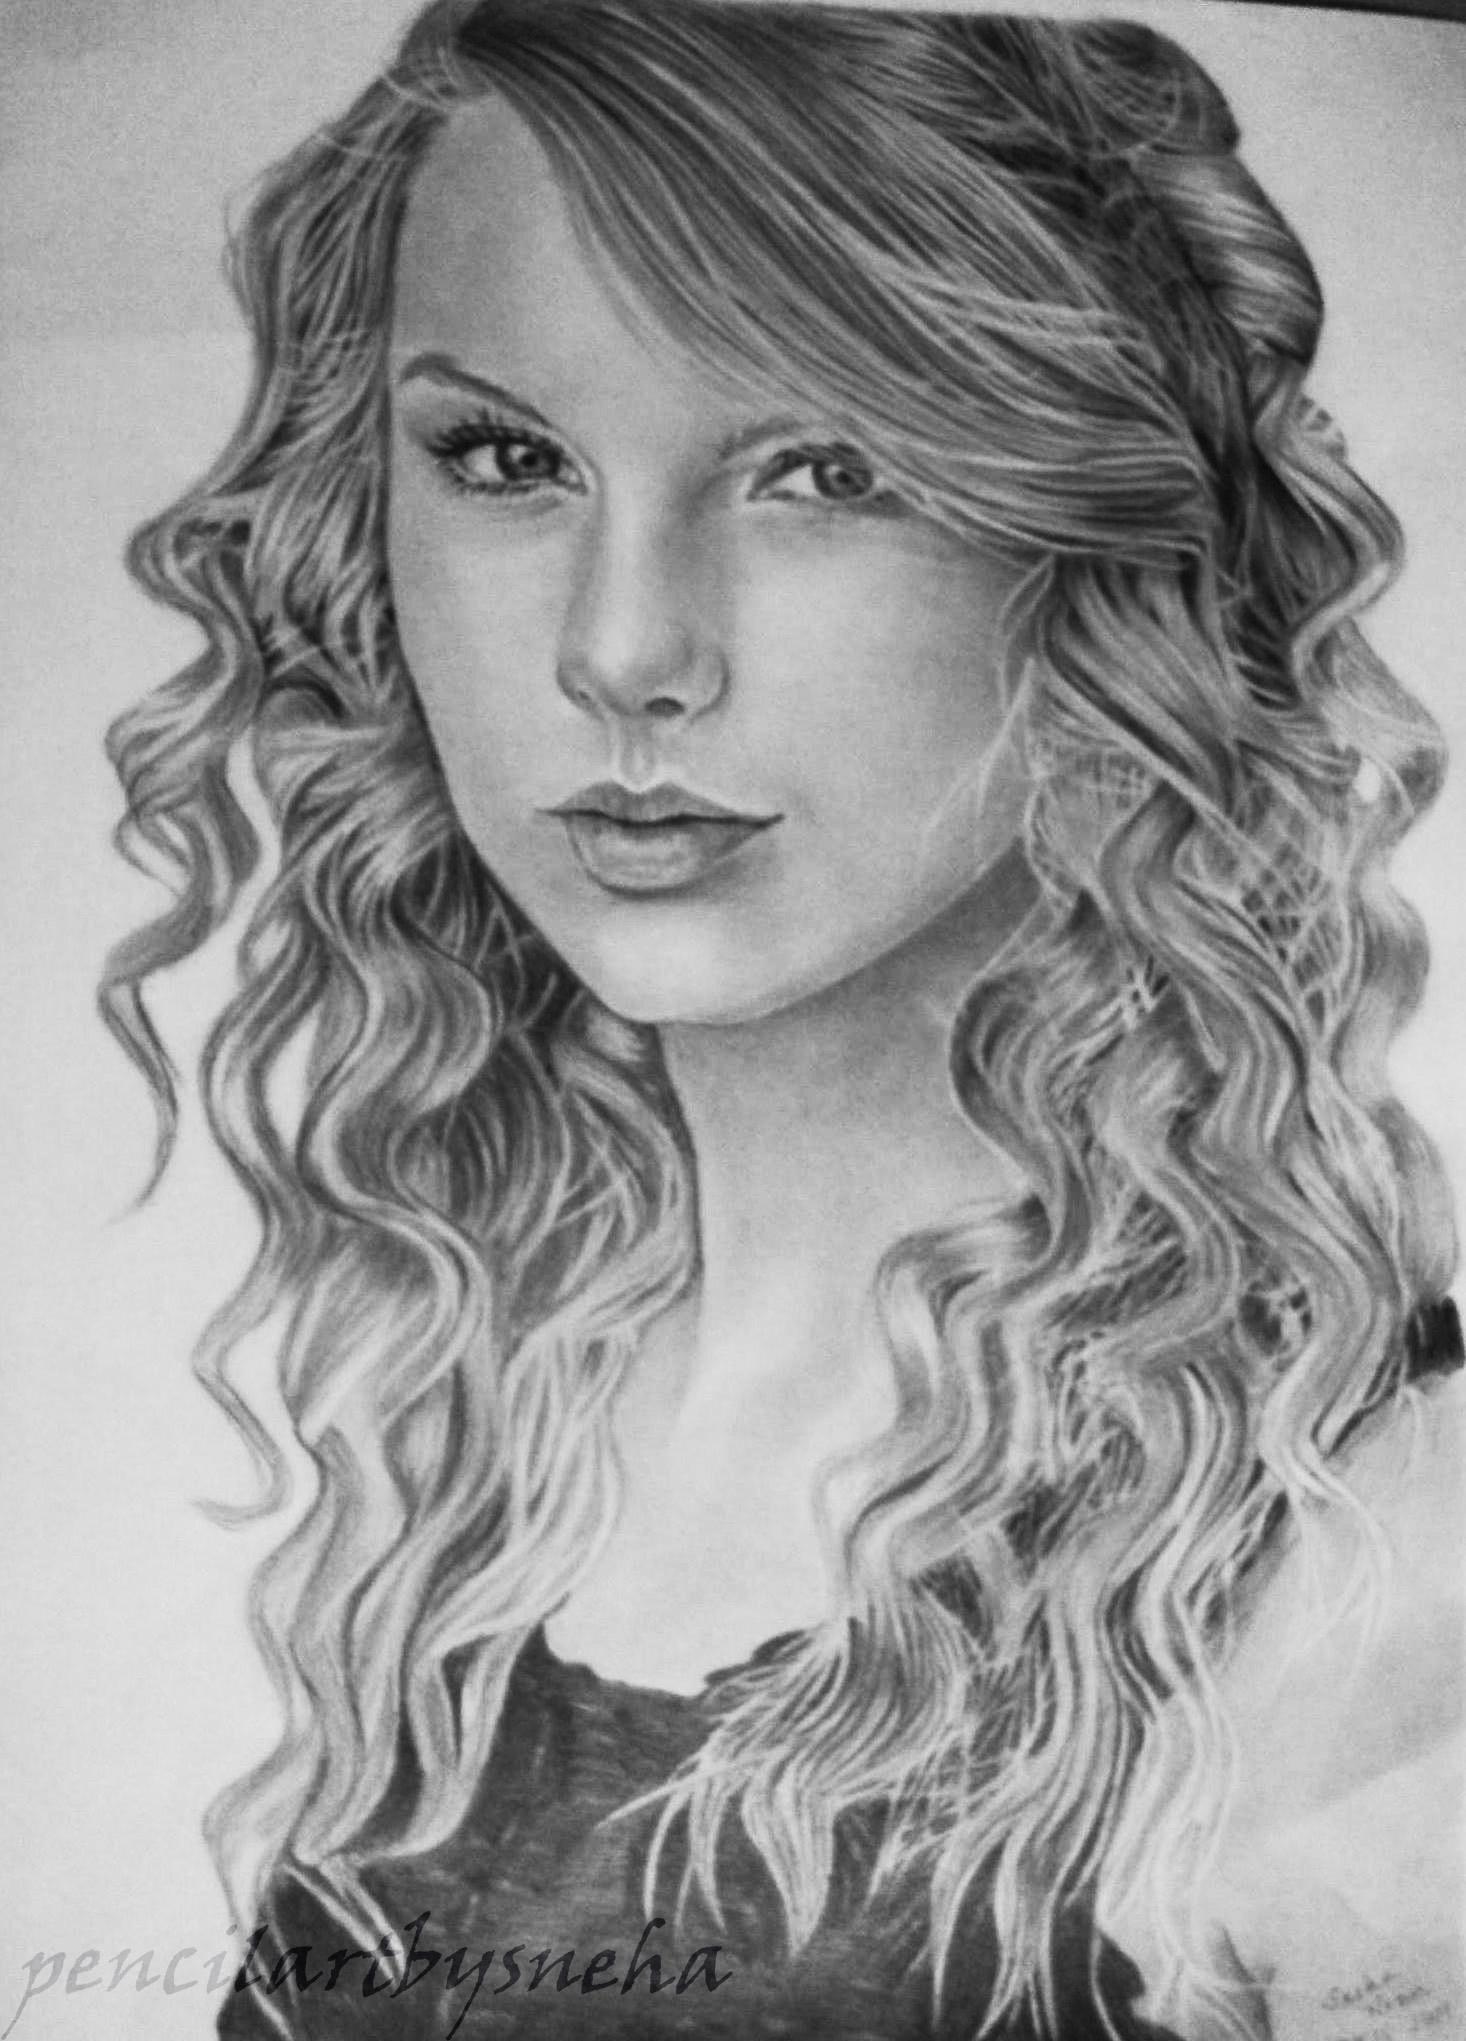 Drawn amd taylor swift Swift drawing Gallery Drawing Drawing